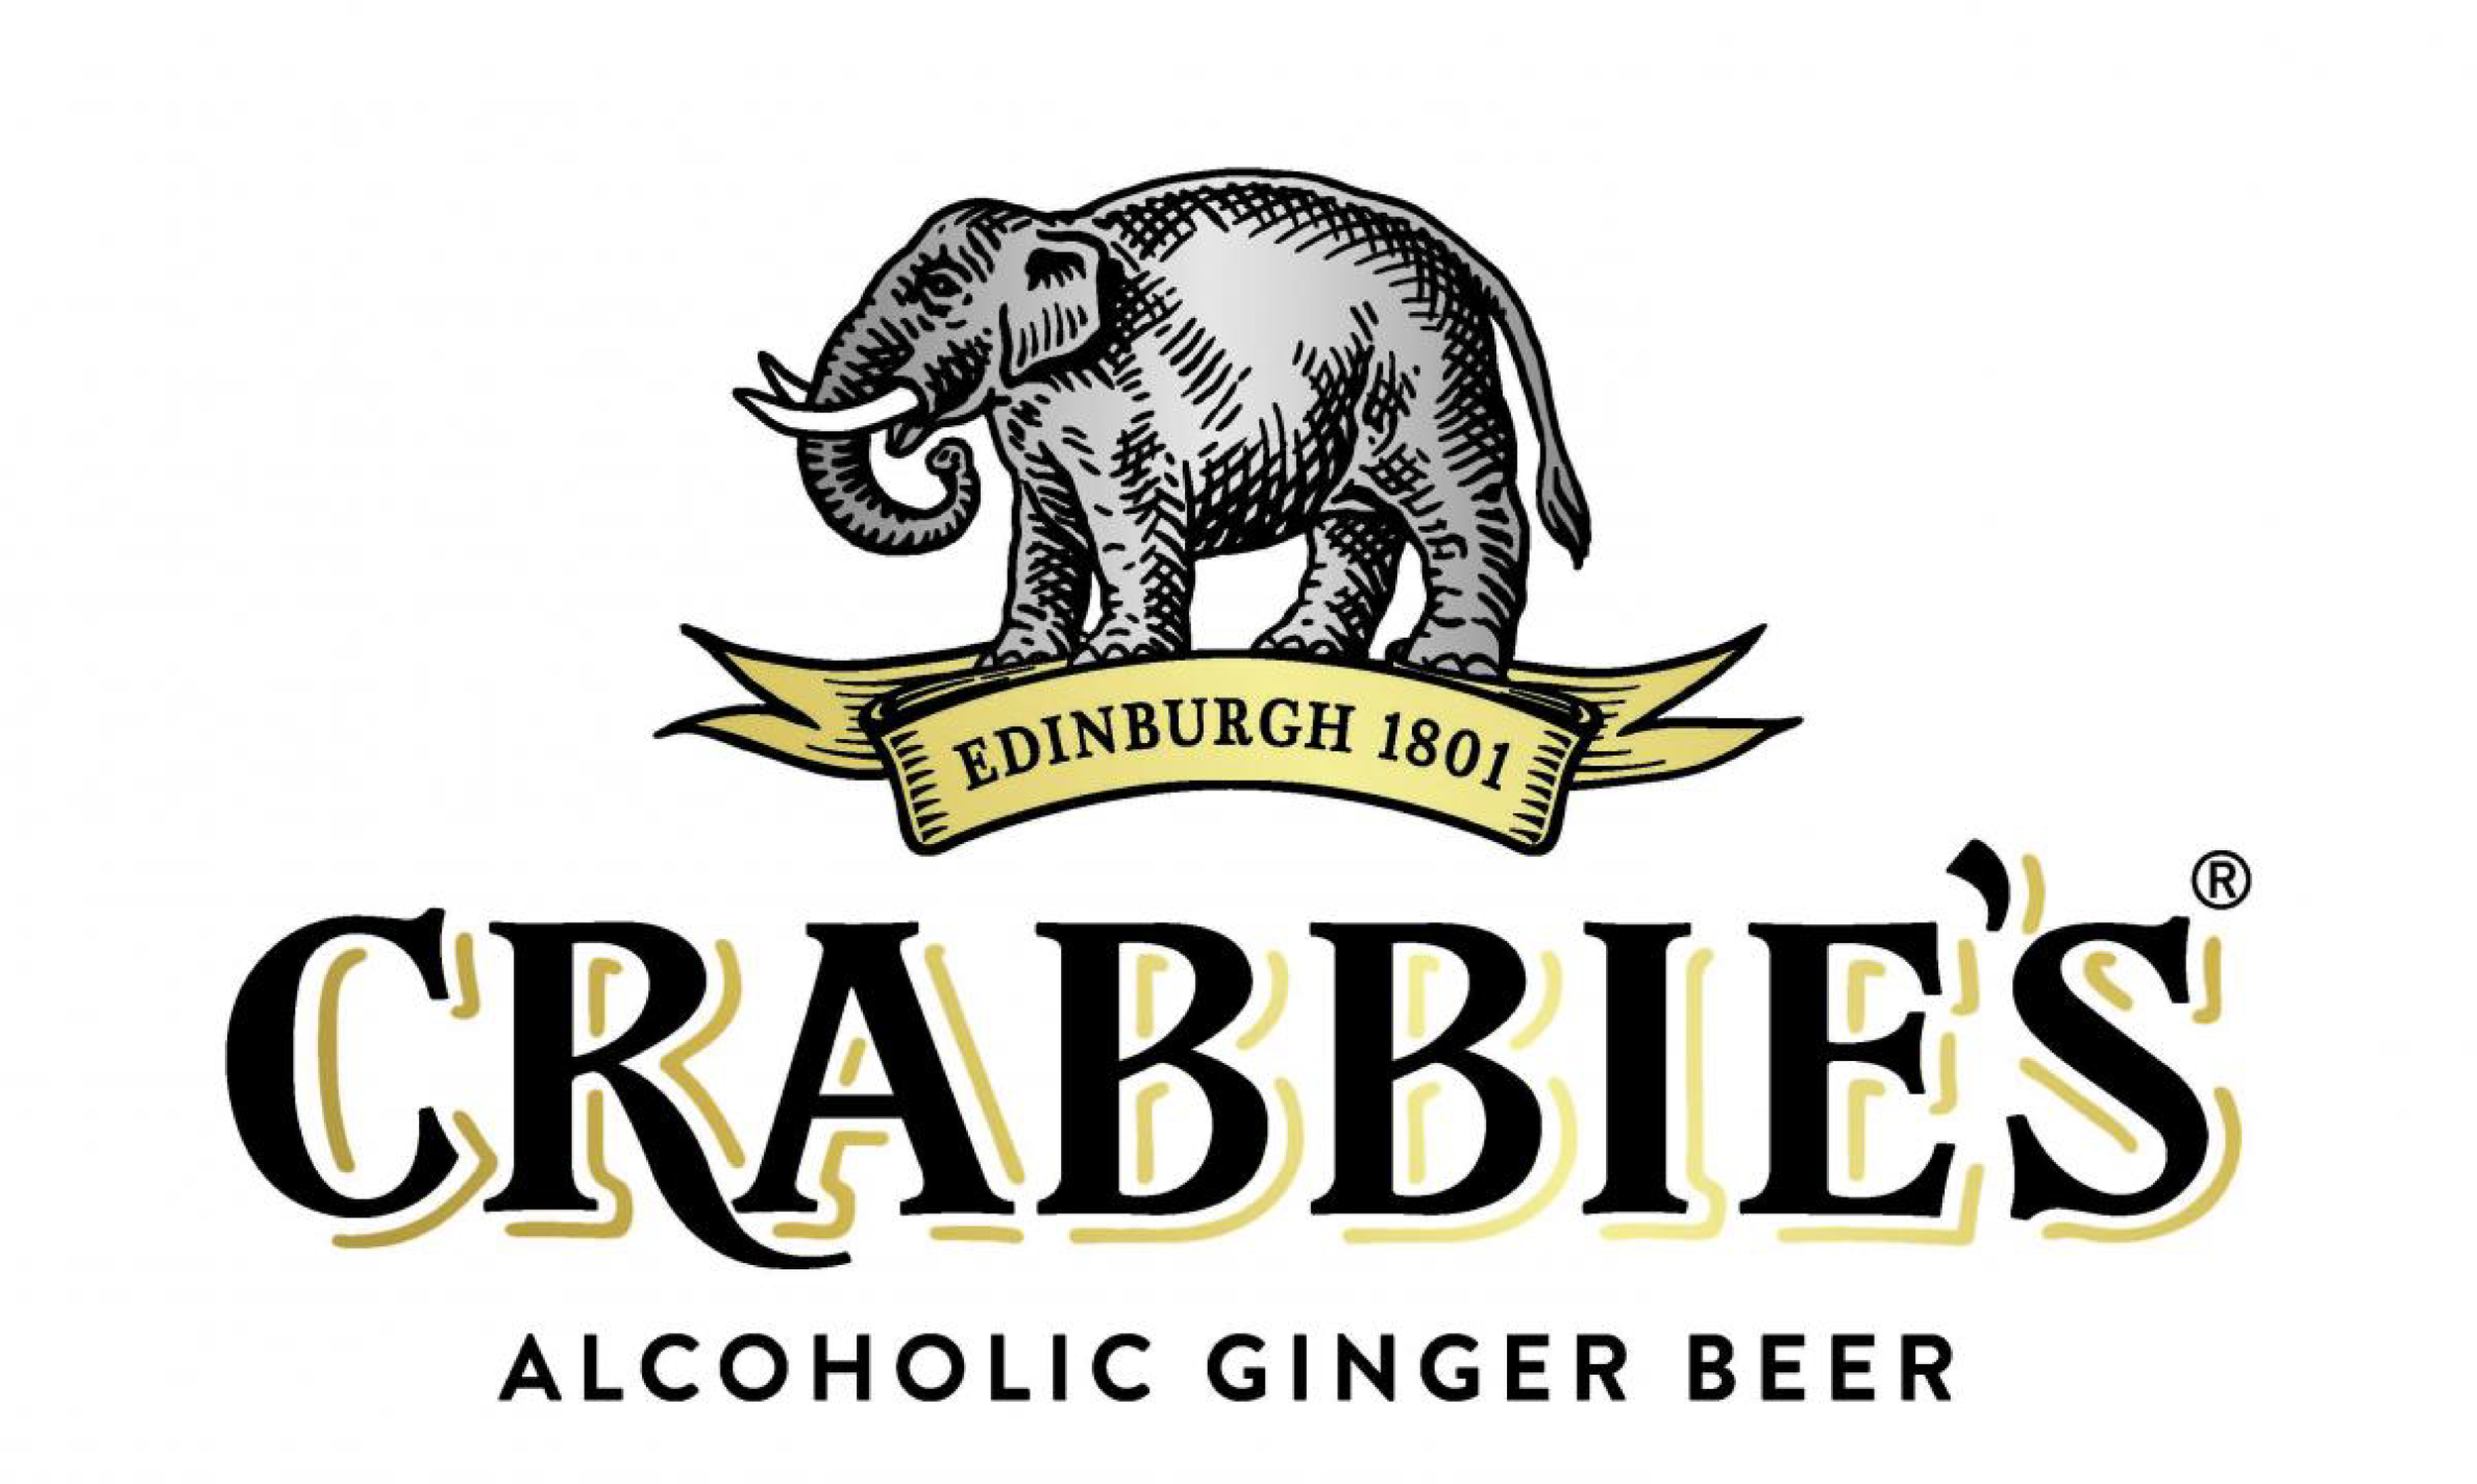 Crabbies logo. Links to Crabbies website.